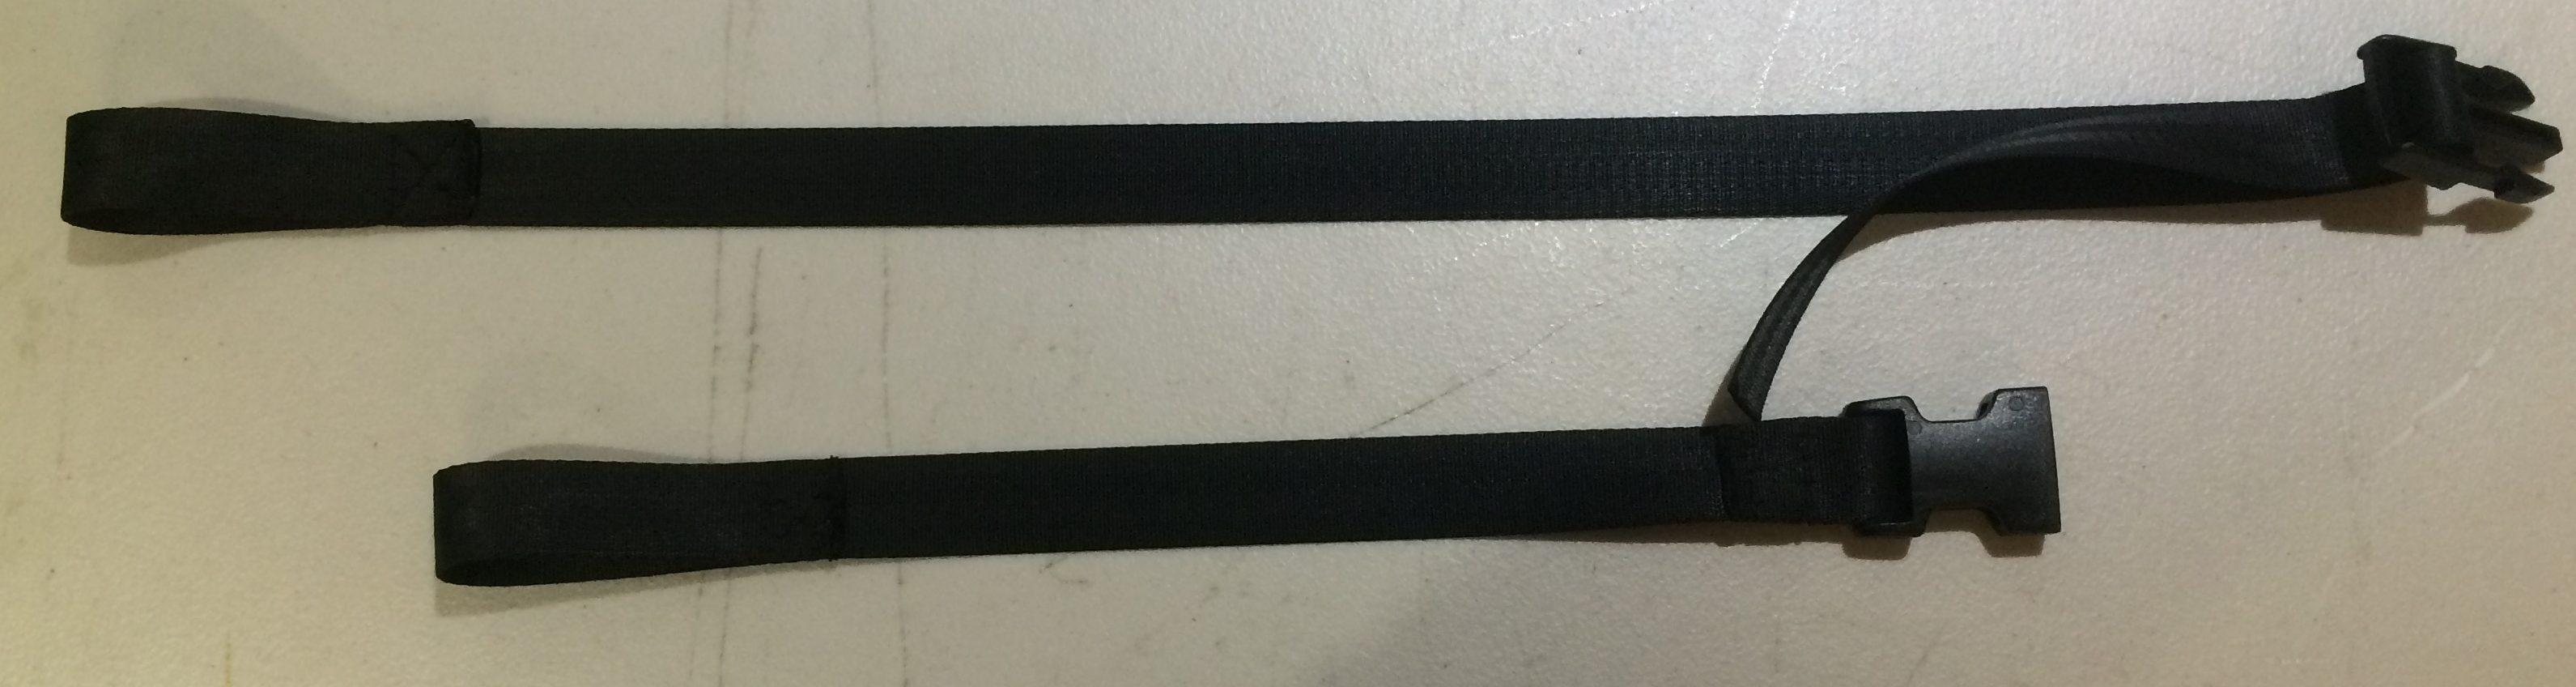 Loop Strap - 25mm Open Straight